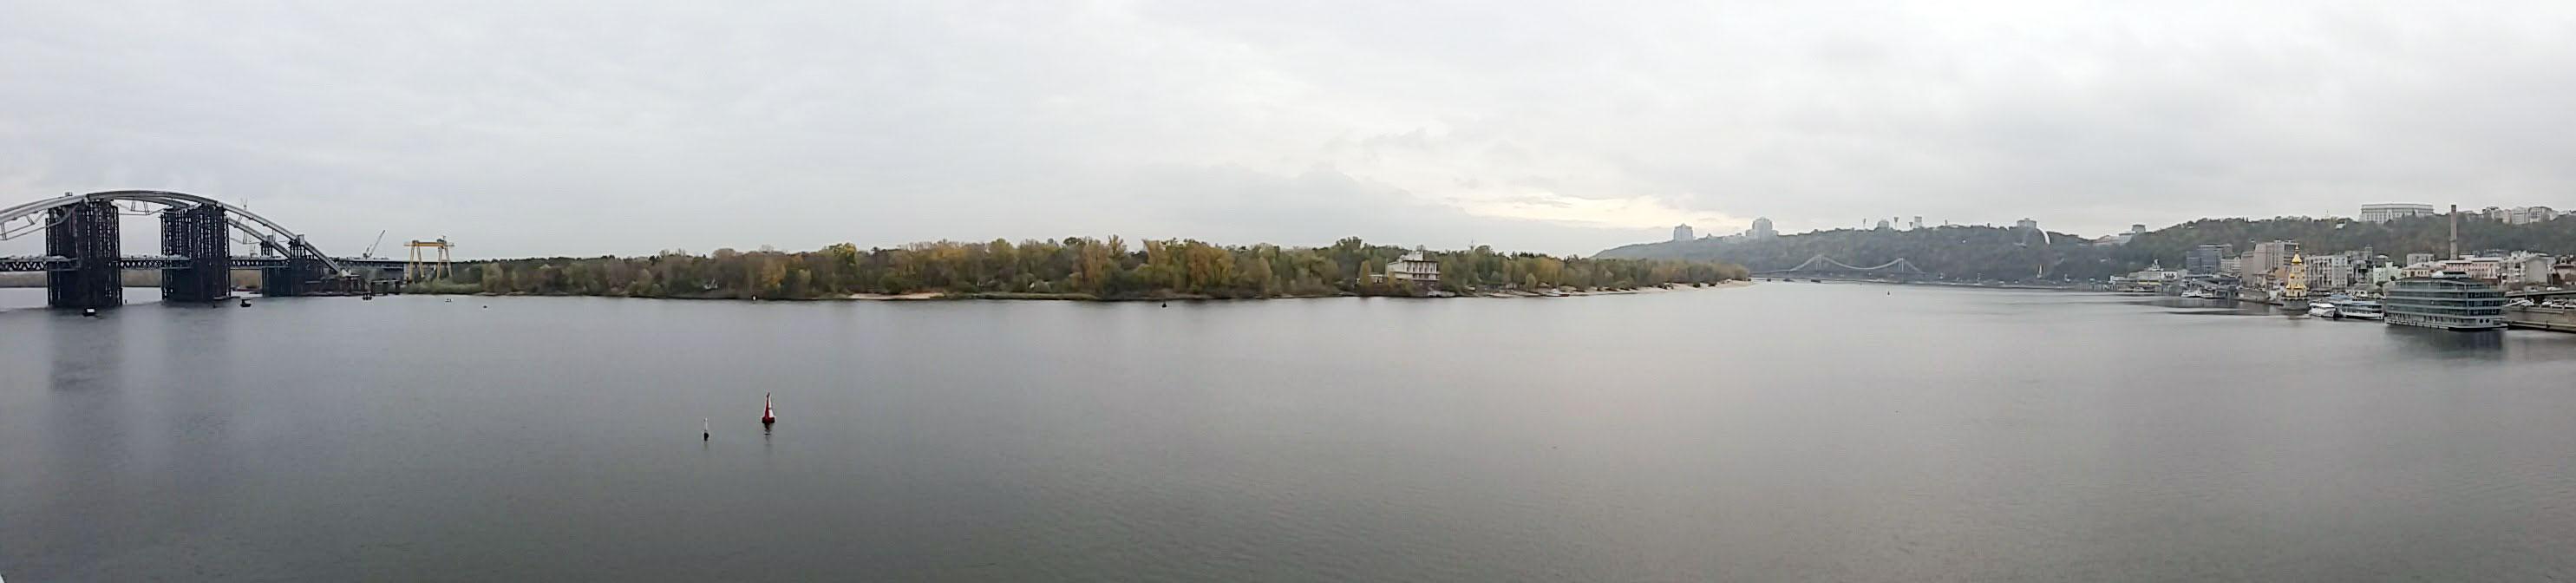 dnieper view